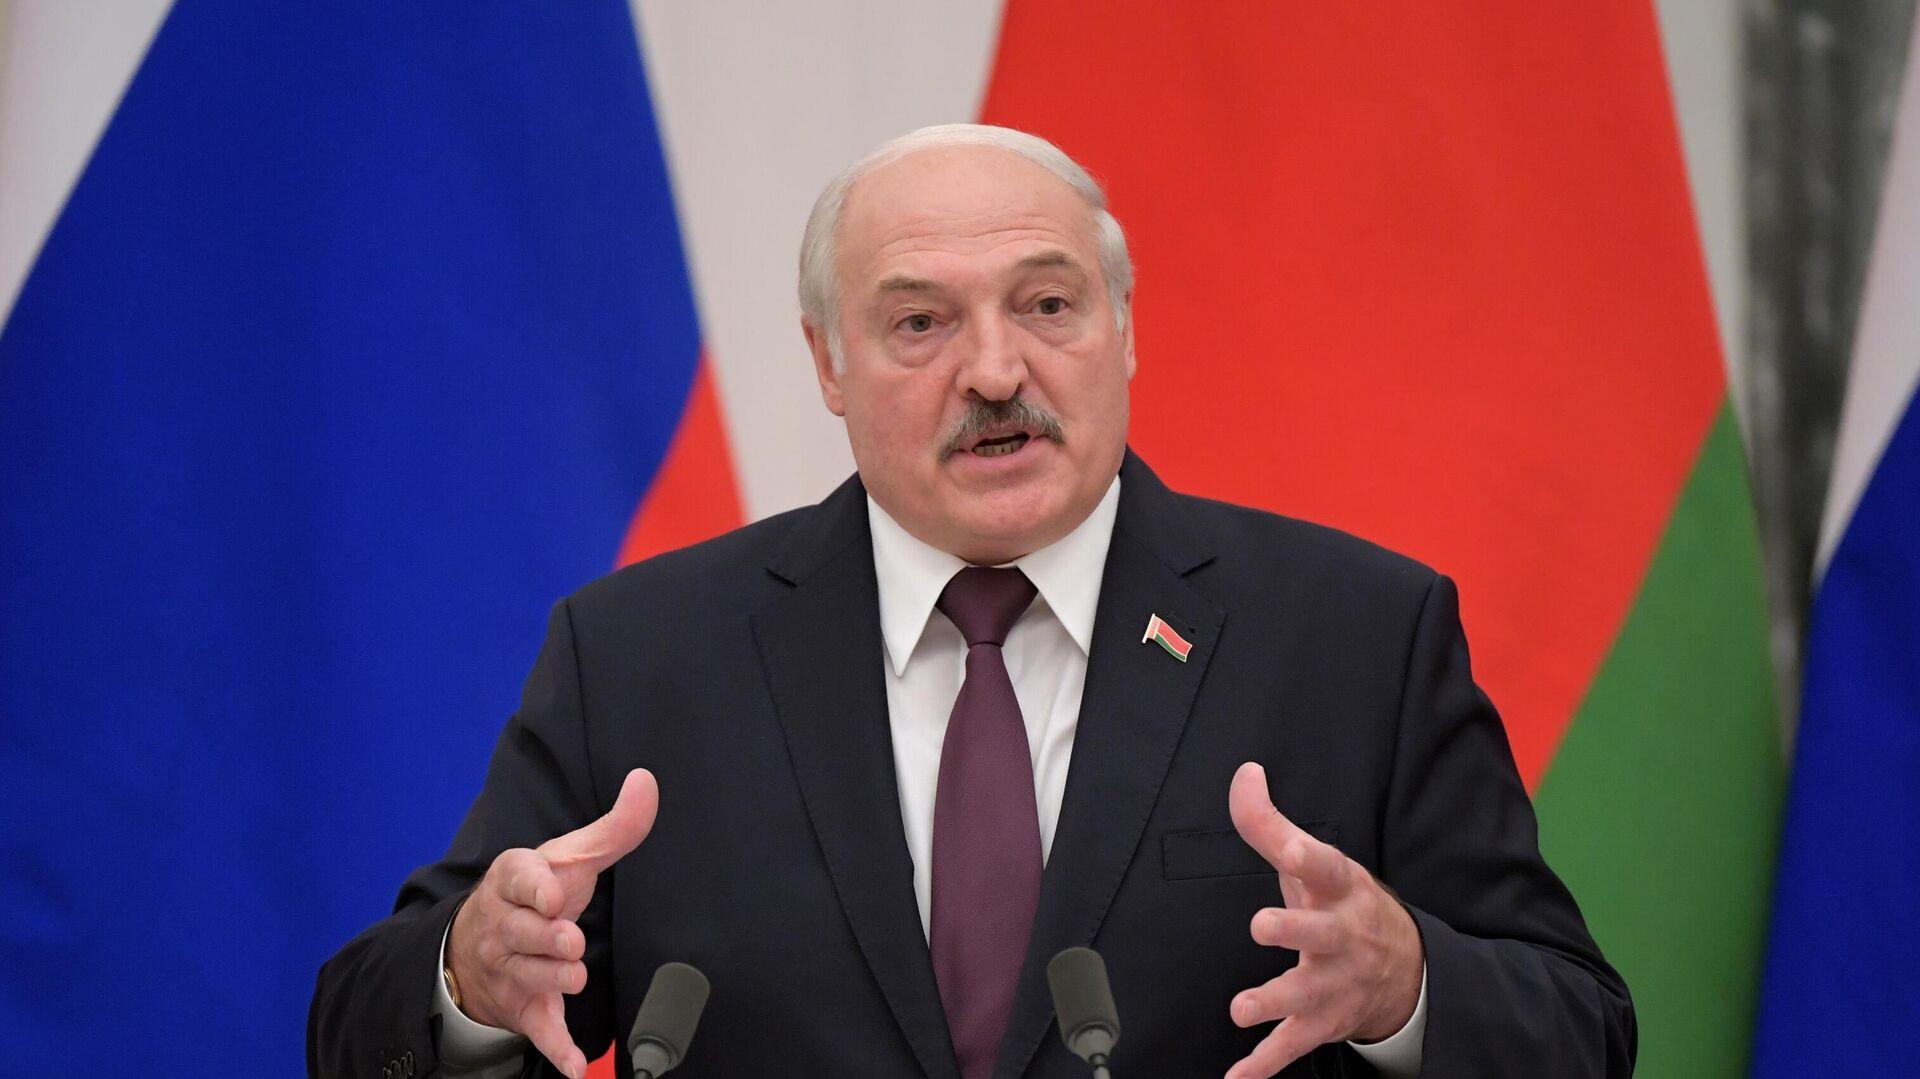 Президент Беларуси Александр Лукашенко - Sputnik Таджикистан, 1920, 16.09.2021